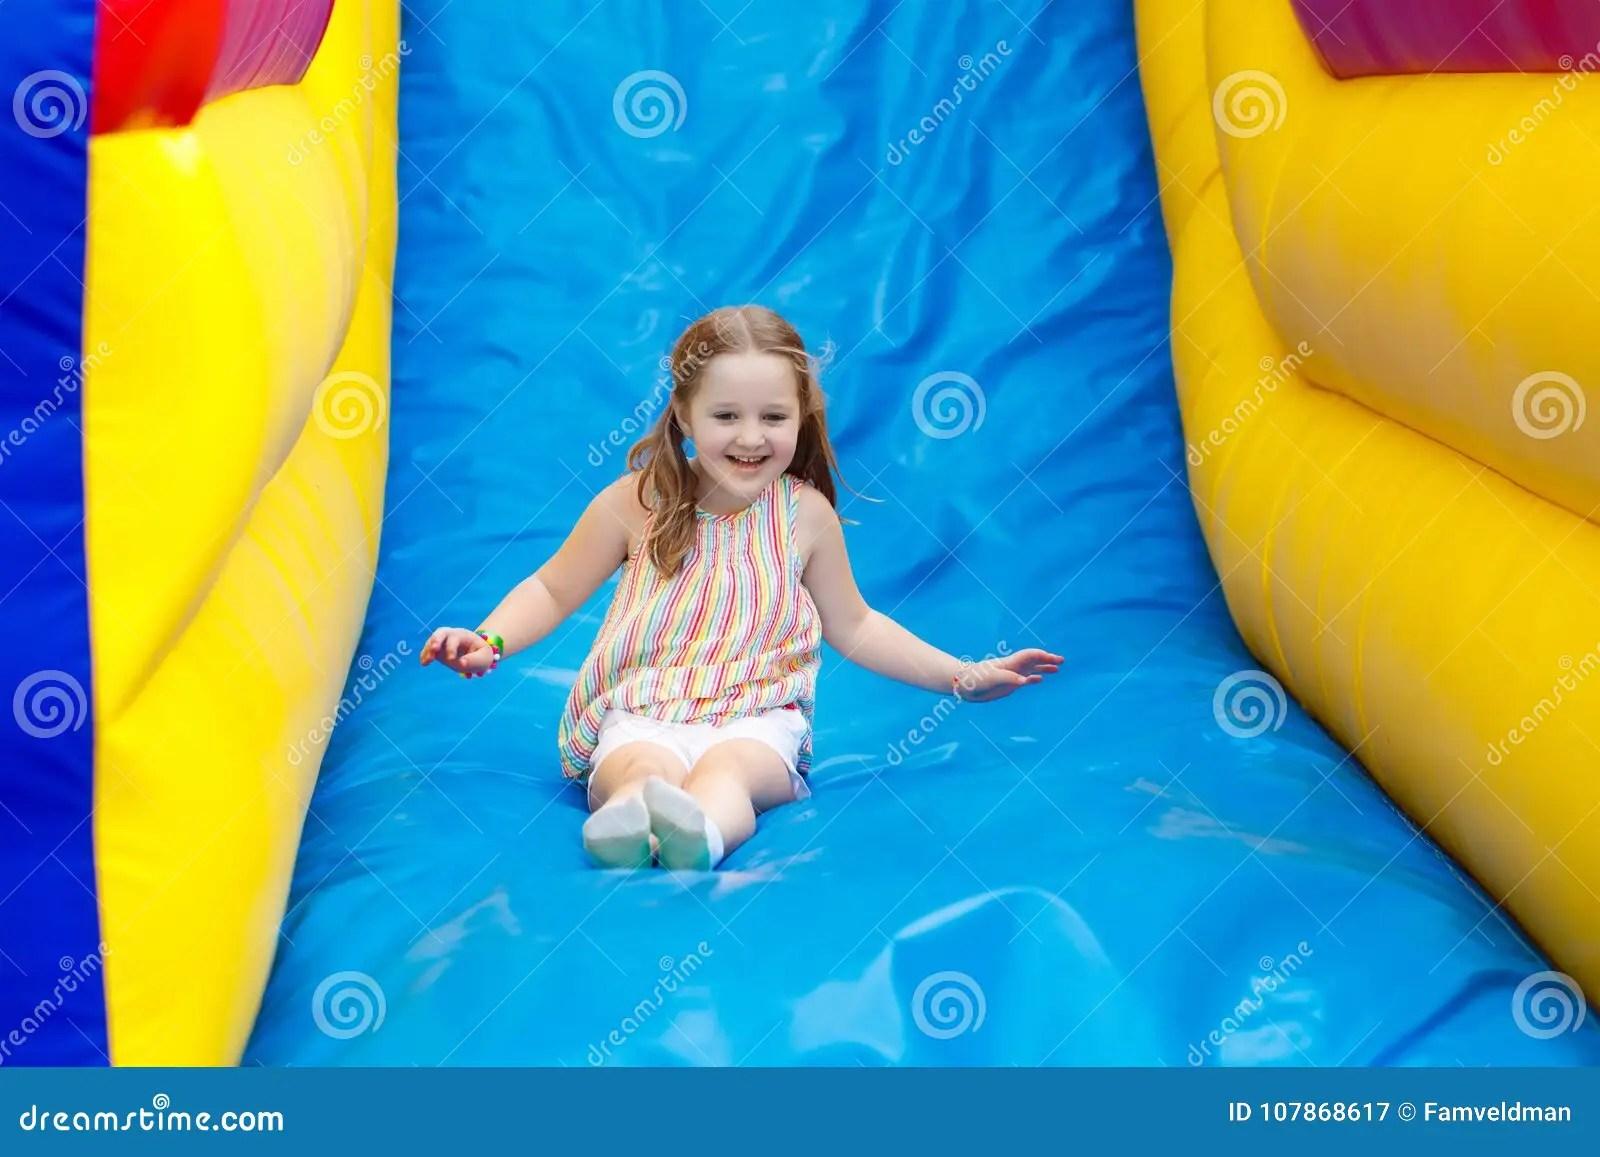 Child Jumping On Playground Trampoline Kids Jump Stock Image